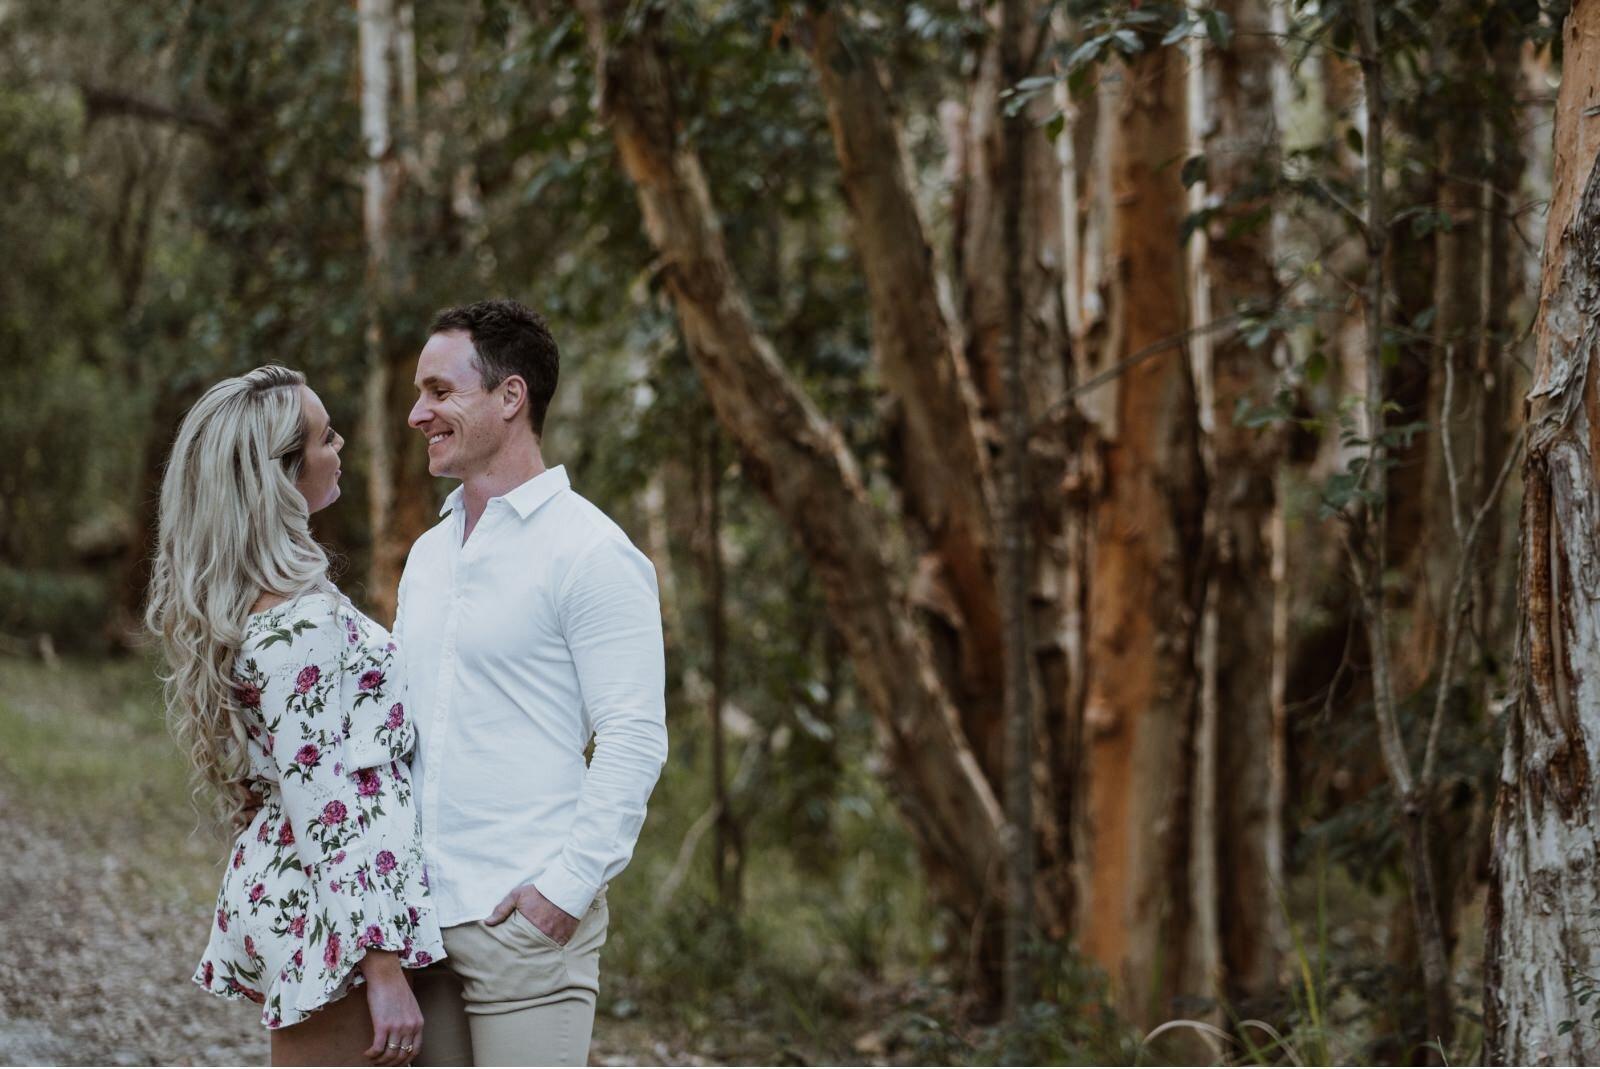 newcastle-wedding-photographer-dudley-engagement-shoot-8.jpg